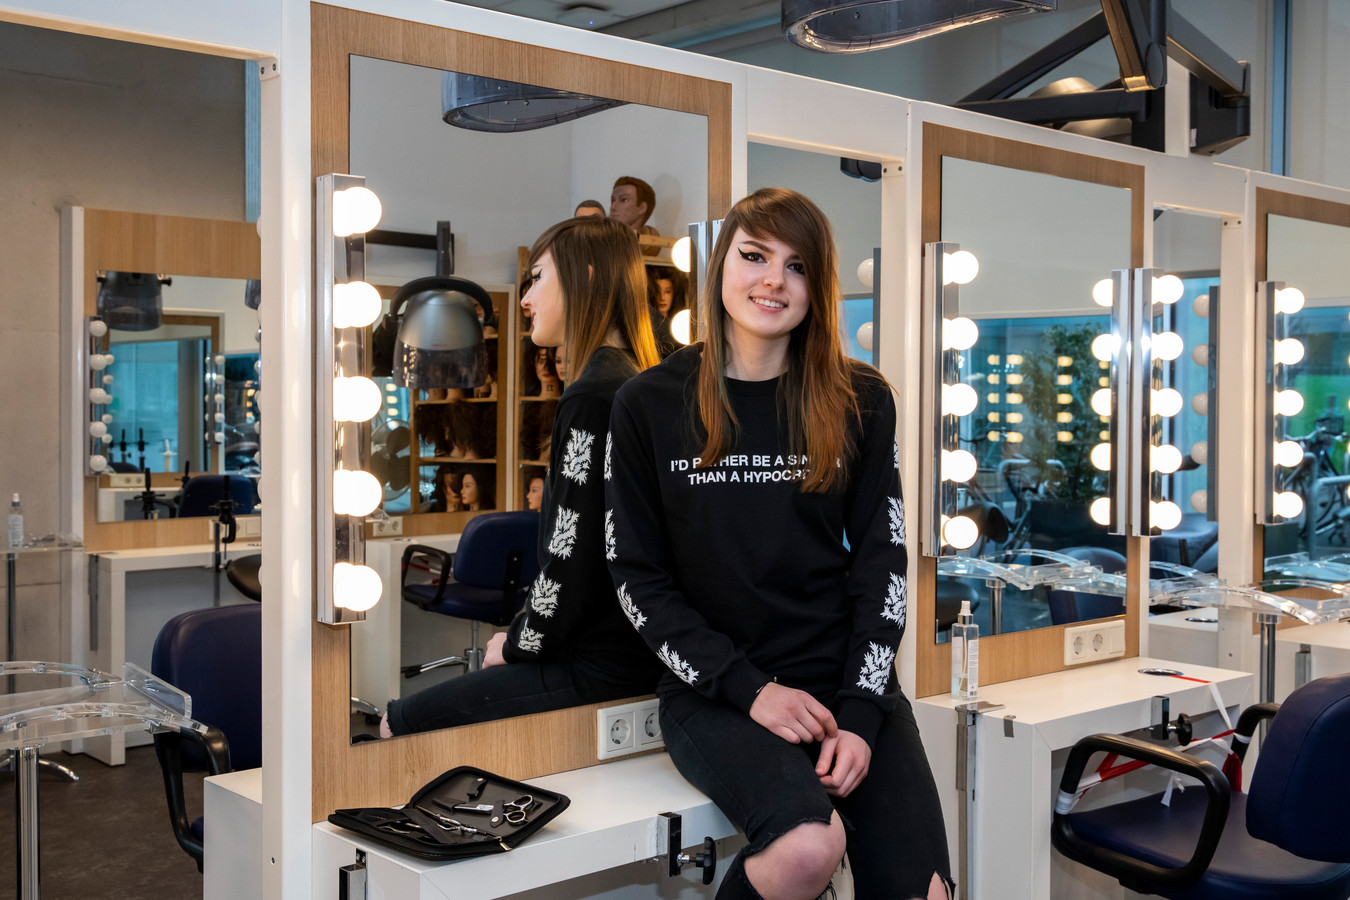 Robbin Lemmen op het Beauty & Fashion College van Zadkine in Hoogvliet.